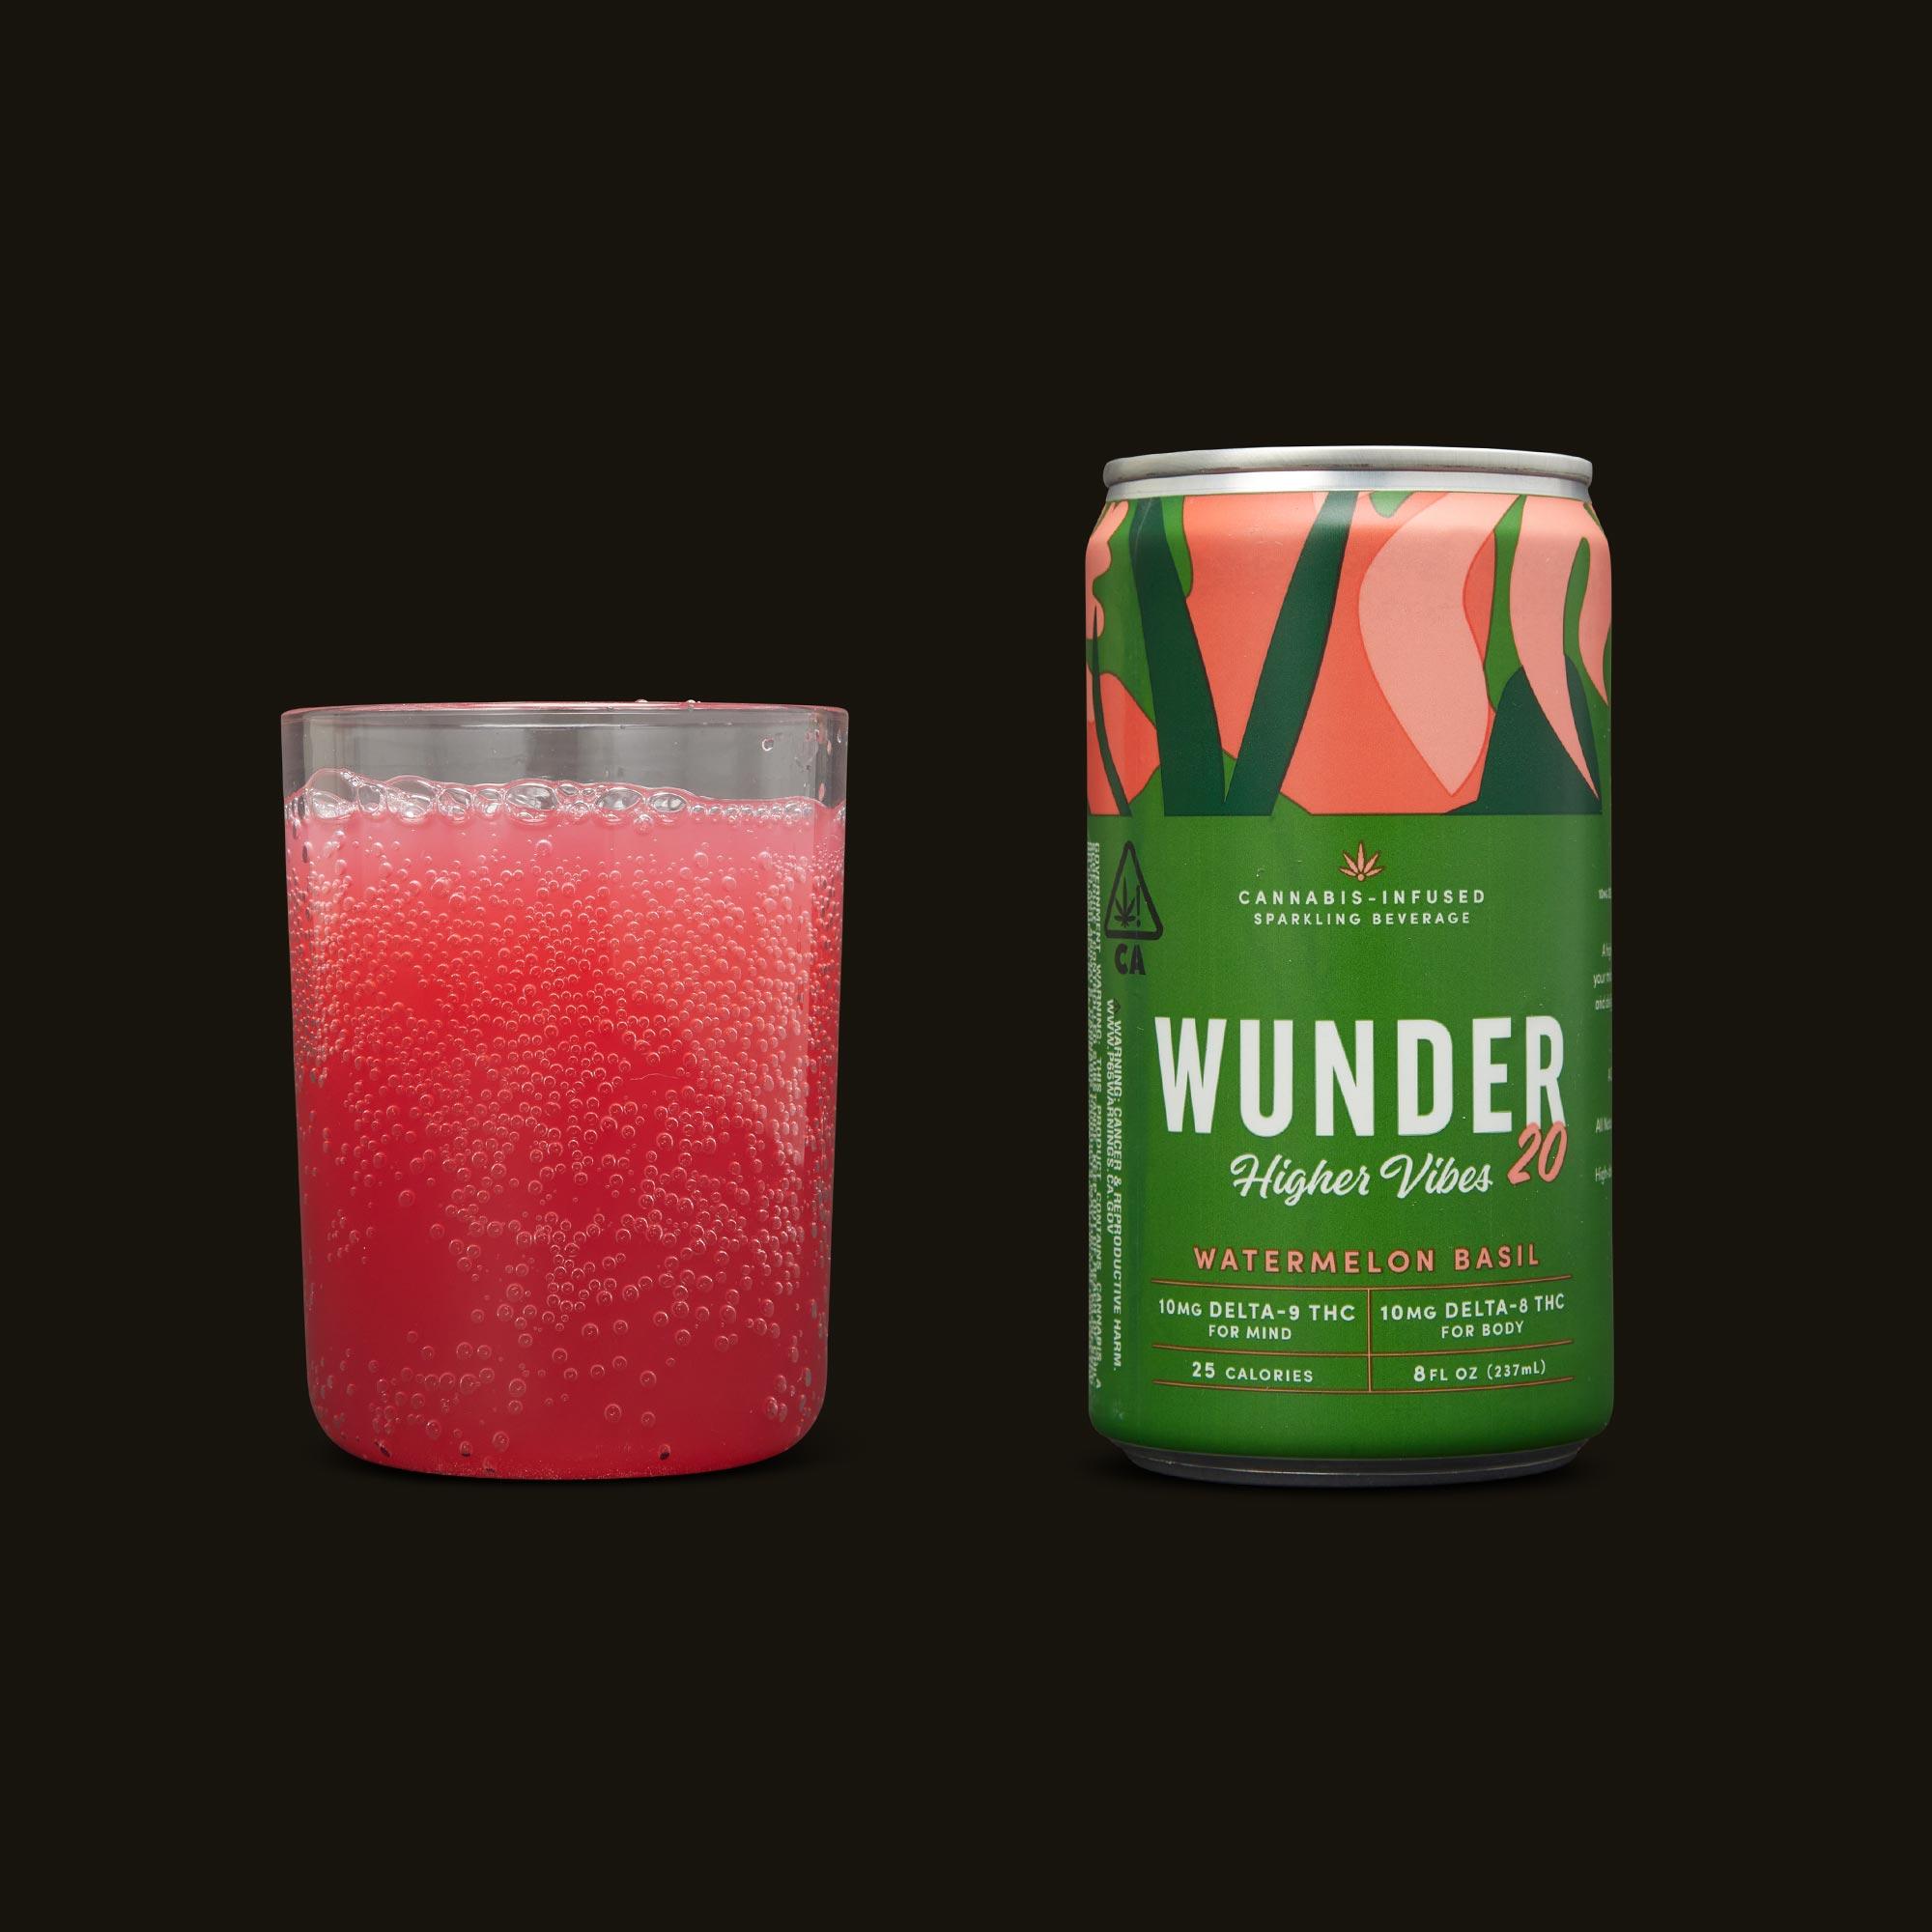 Wunder Watermelon Basil Higher Vibes